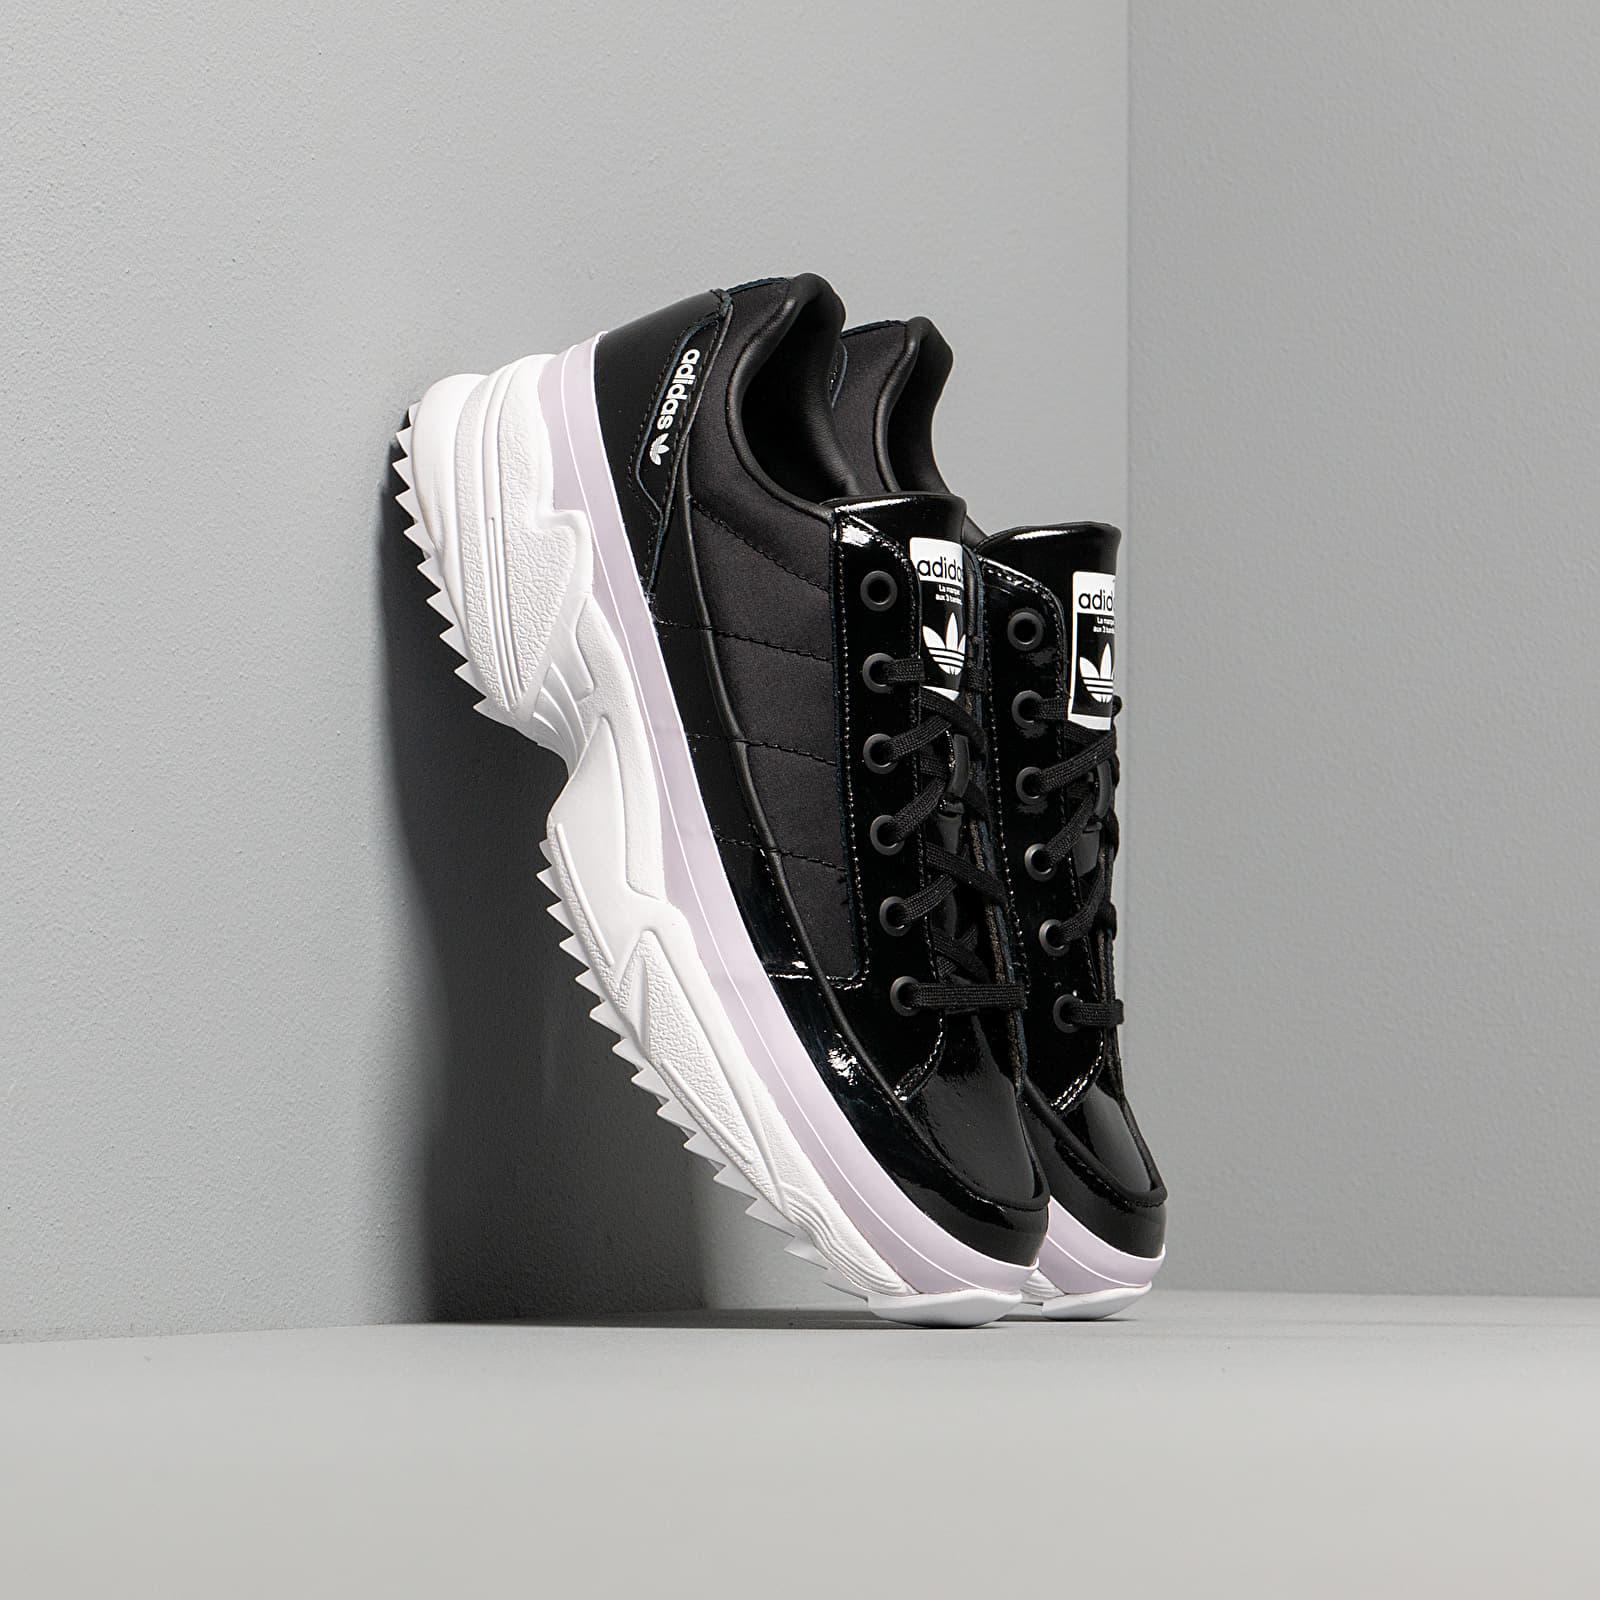 Buty damskie adidas Kiellor W Core Black/ Core Black/ Purple Tint